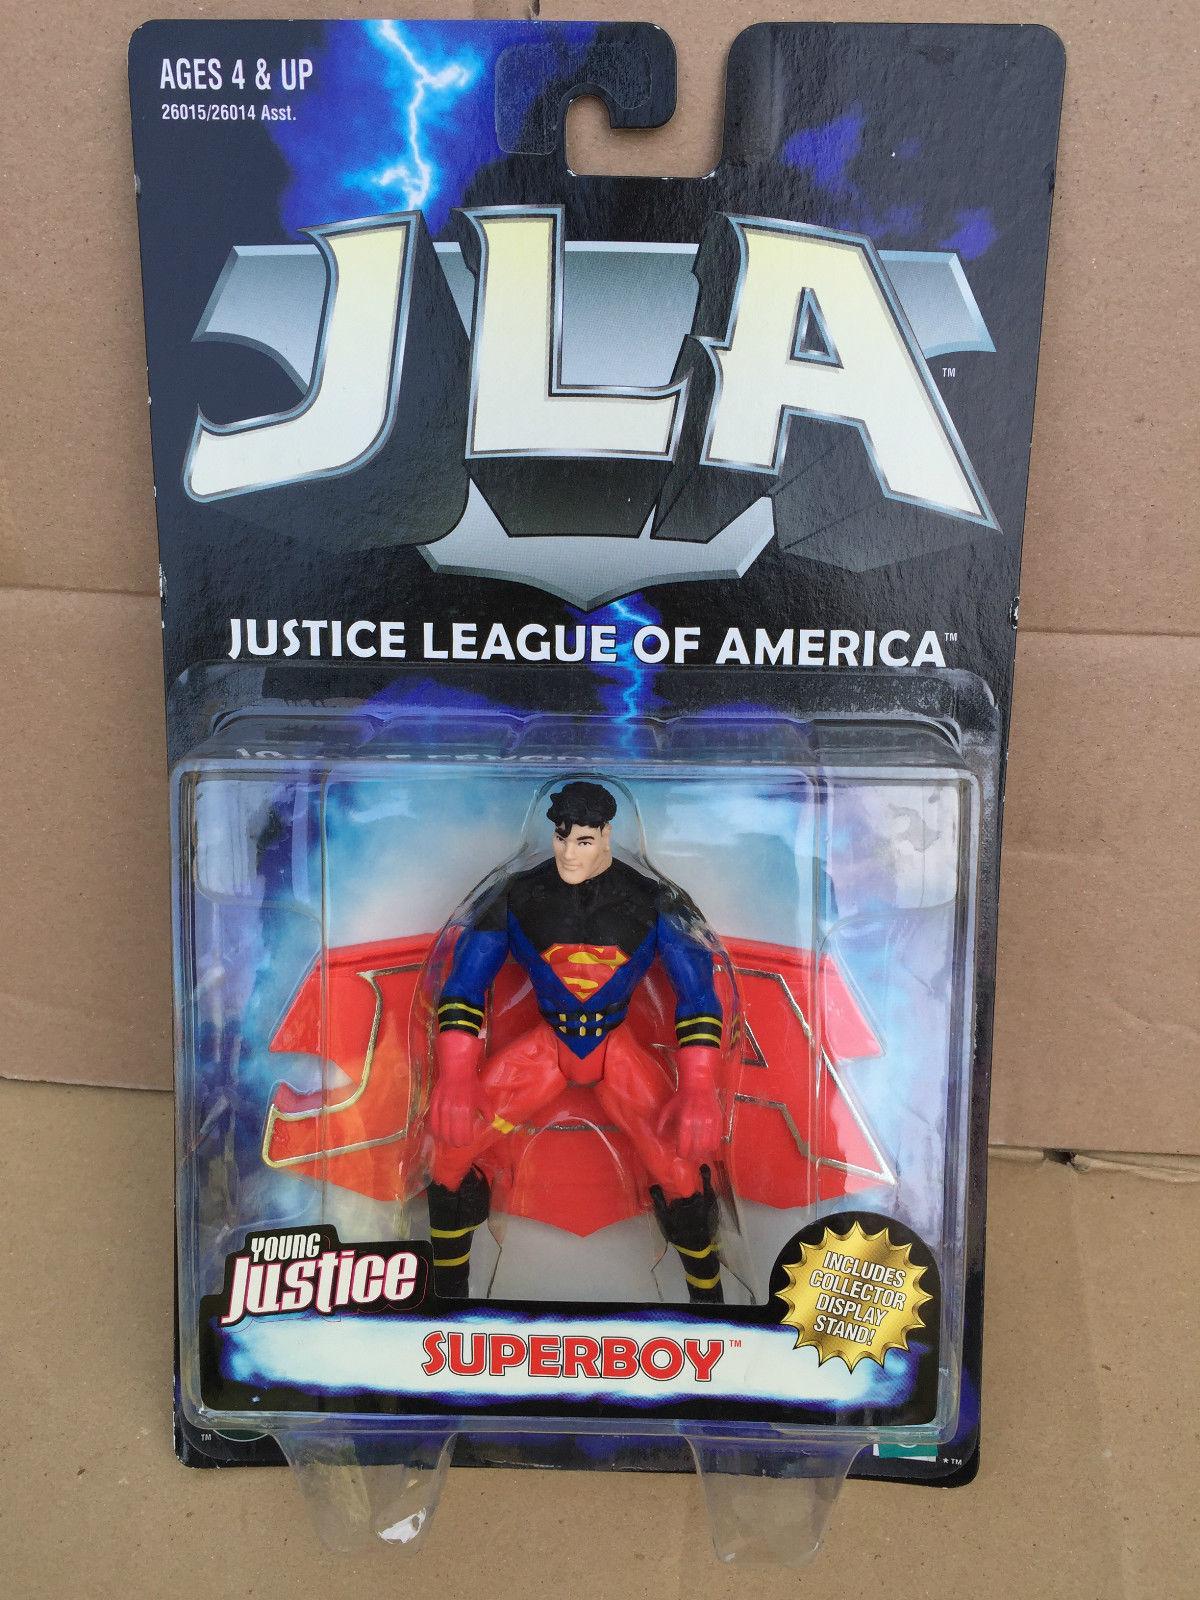 superboy_1.jpg